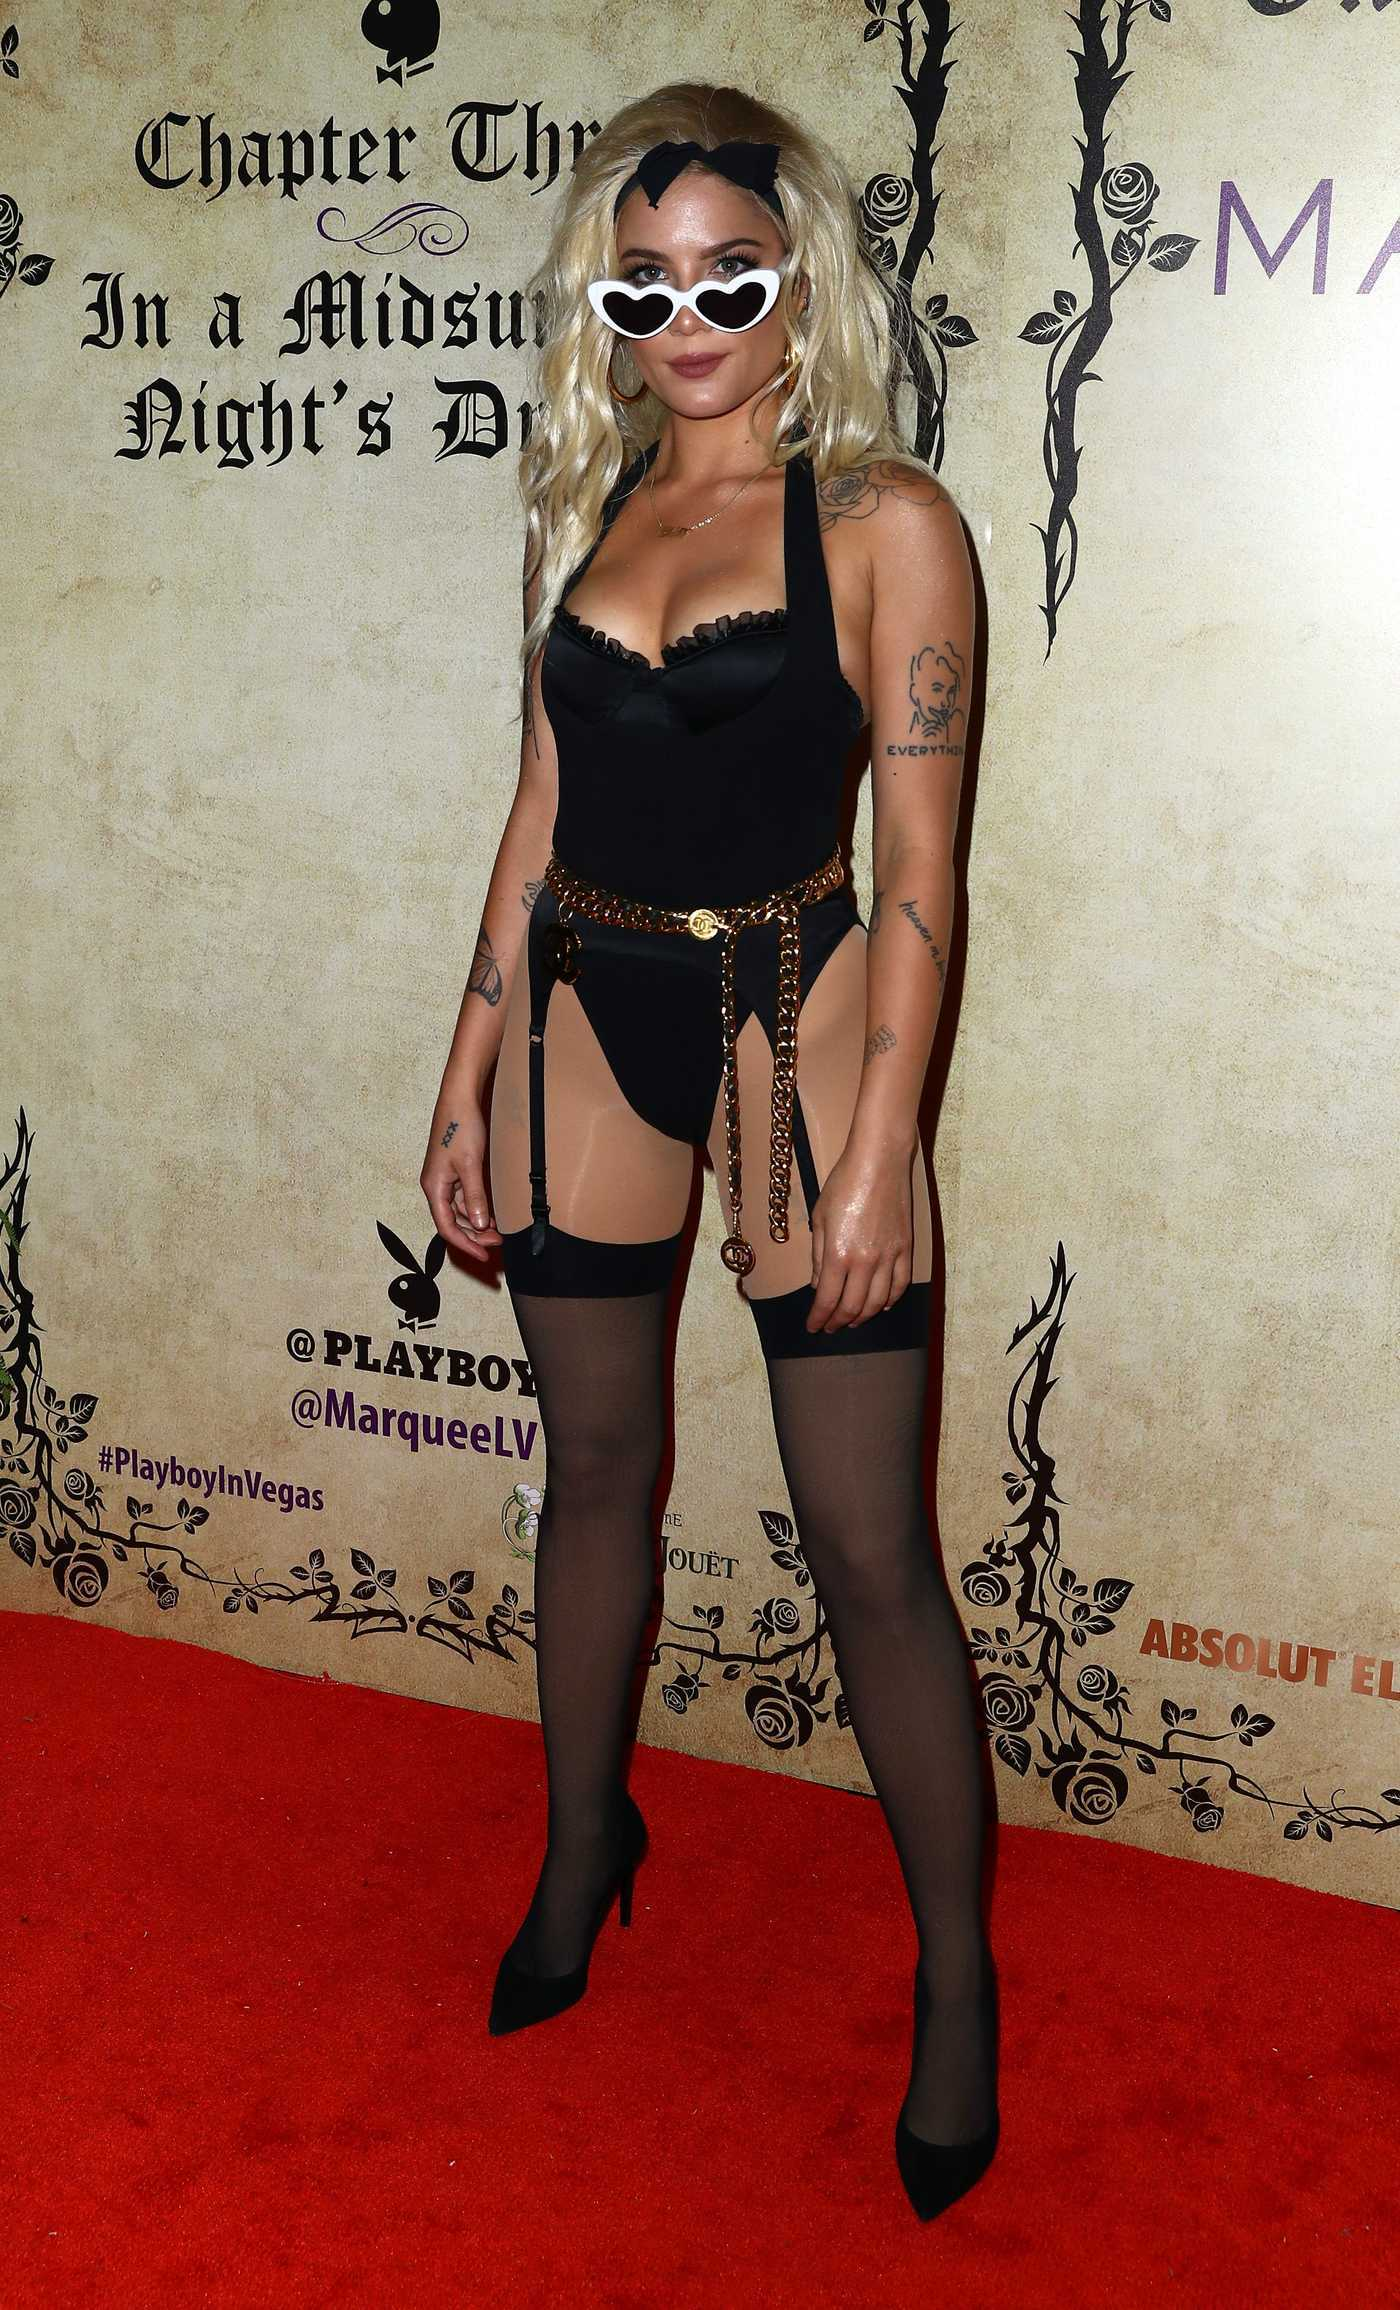 Halsey in a Black Lingerie During Playboy's Midsummer Night's Dream at Marquee Nightclub in Las Vegas 07/28/2018